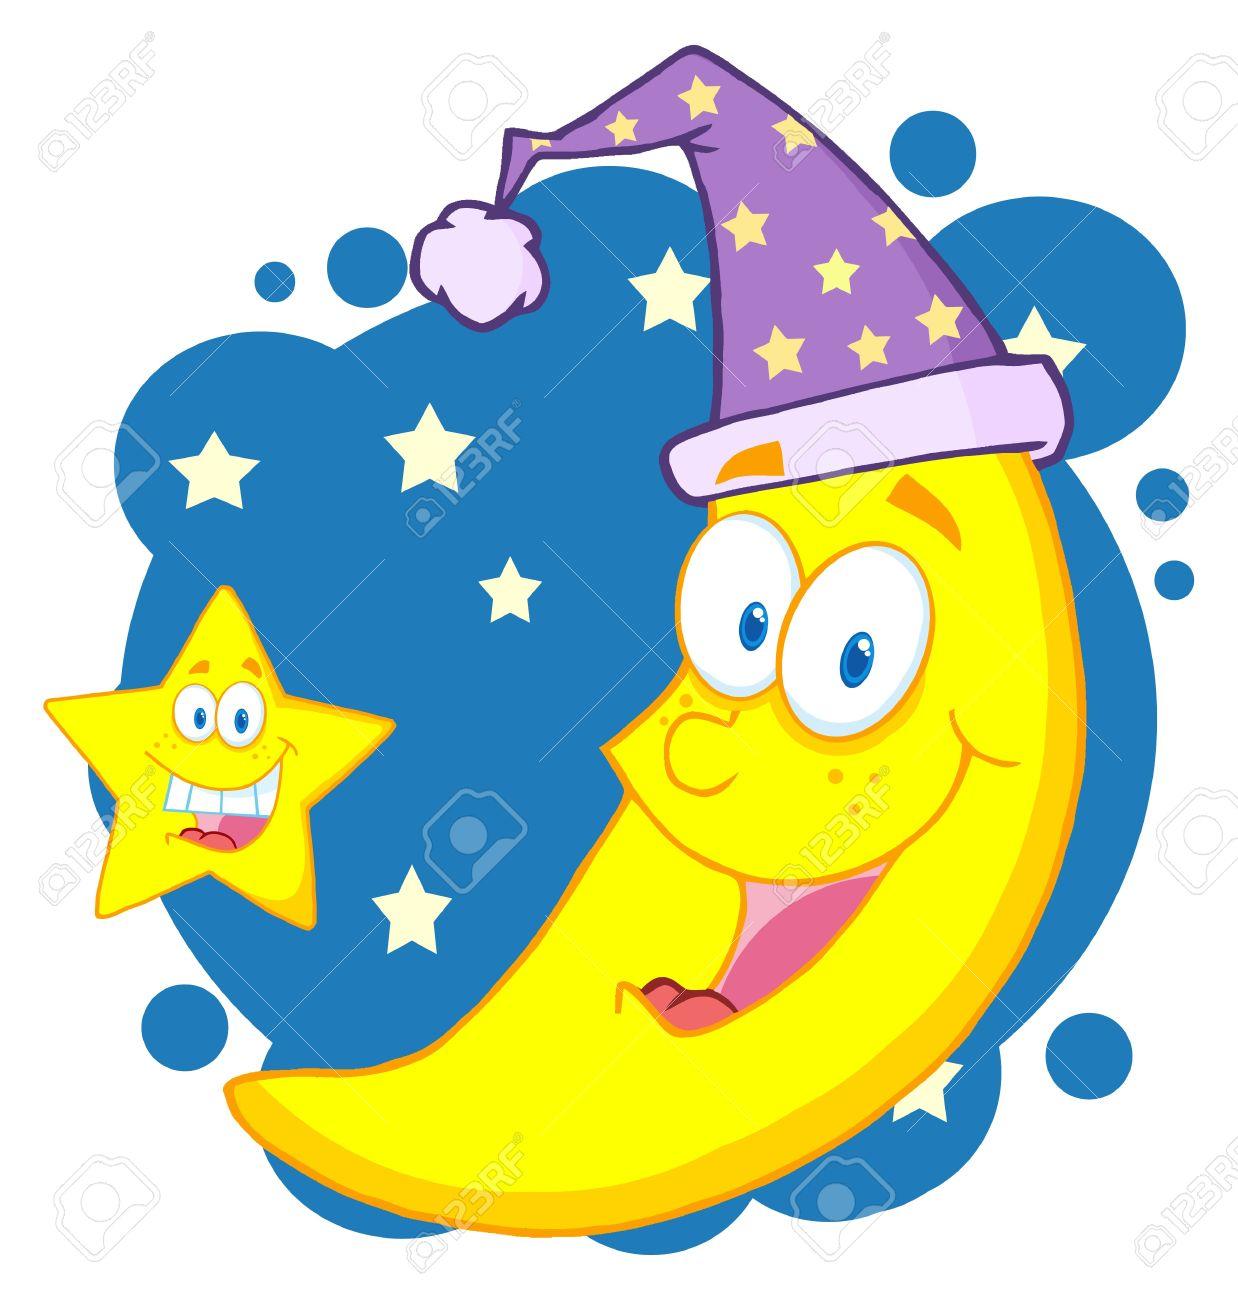 1238x1300 Lunar Clipart Smiley